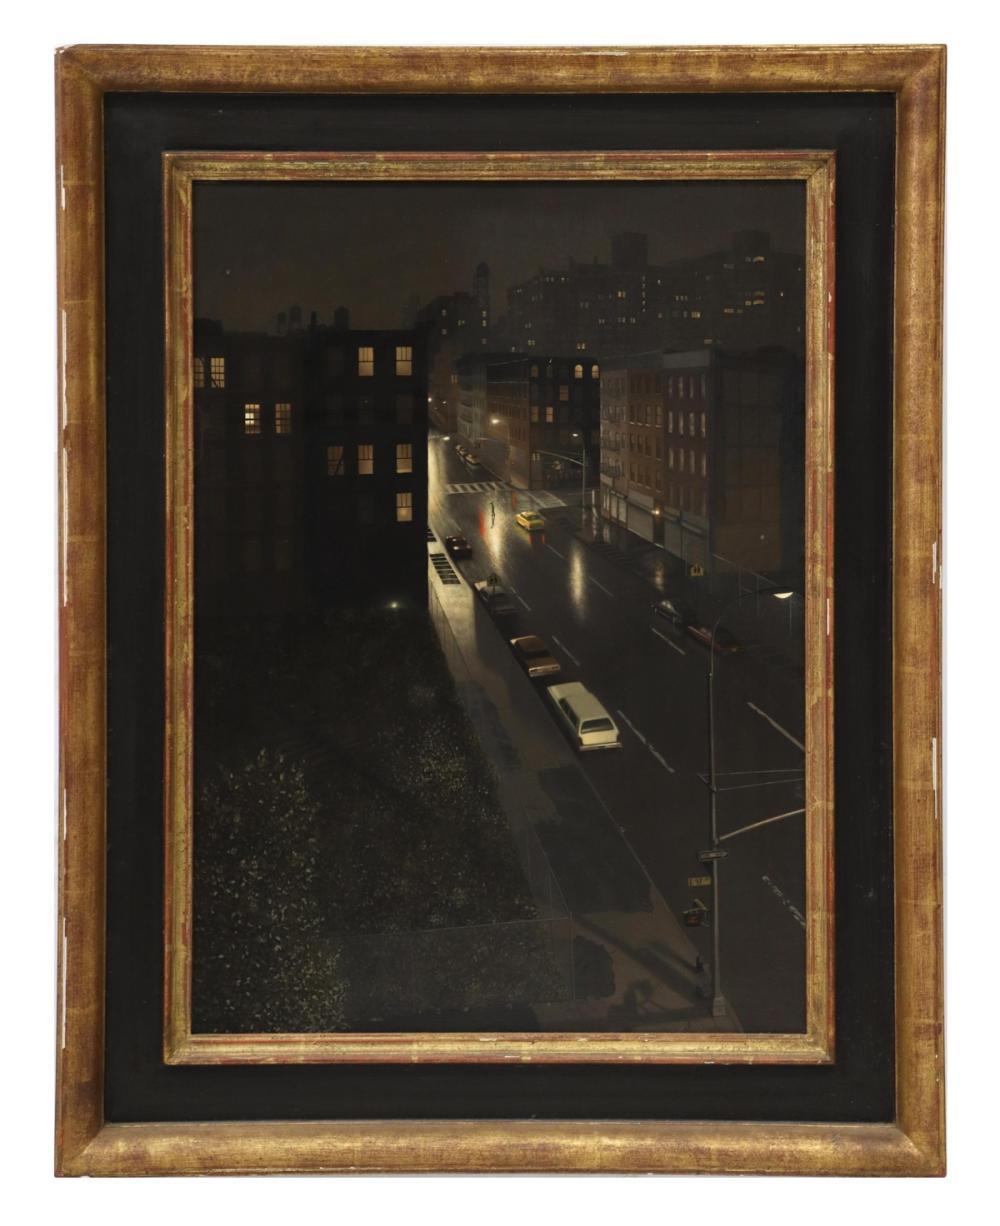 MAX FERGUSON (NY, B.1959) 'HARLEM NOCTURNE'